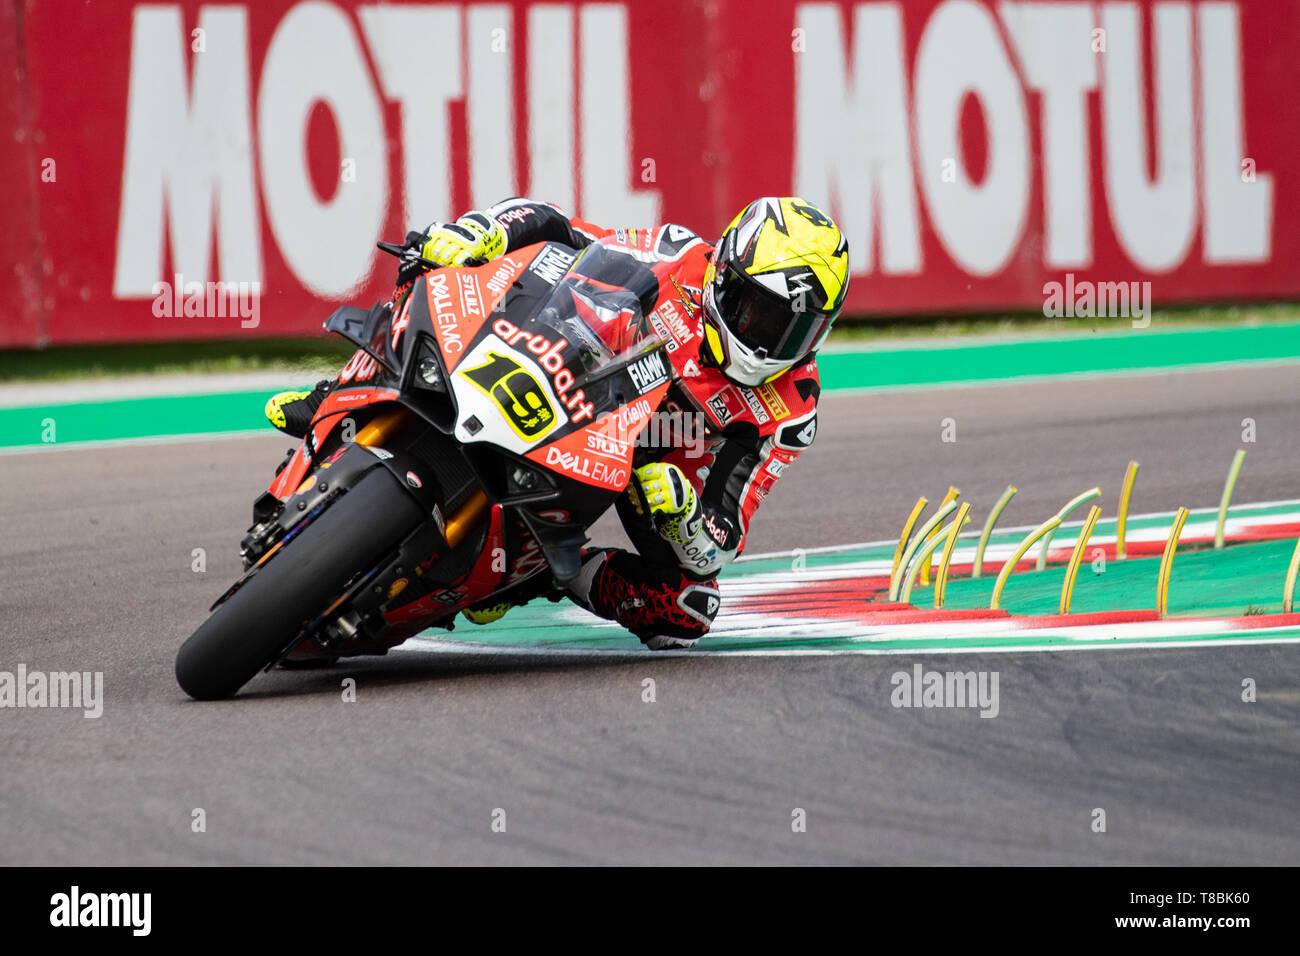 WorldSBK Superbike championship weekend in the italian circuit of Imola Dino and Enzo Ferrari Stock Photo